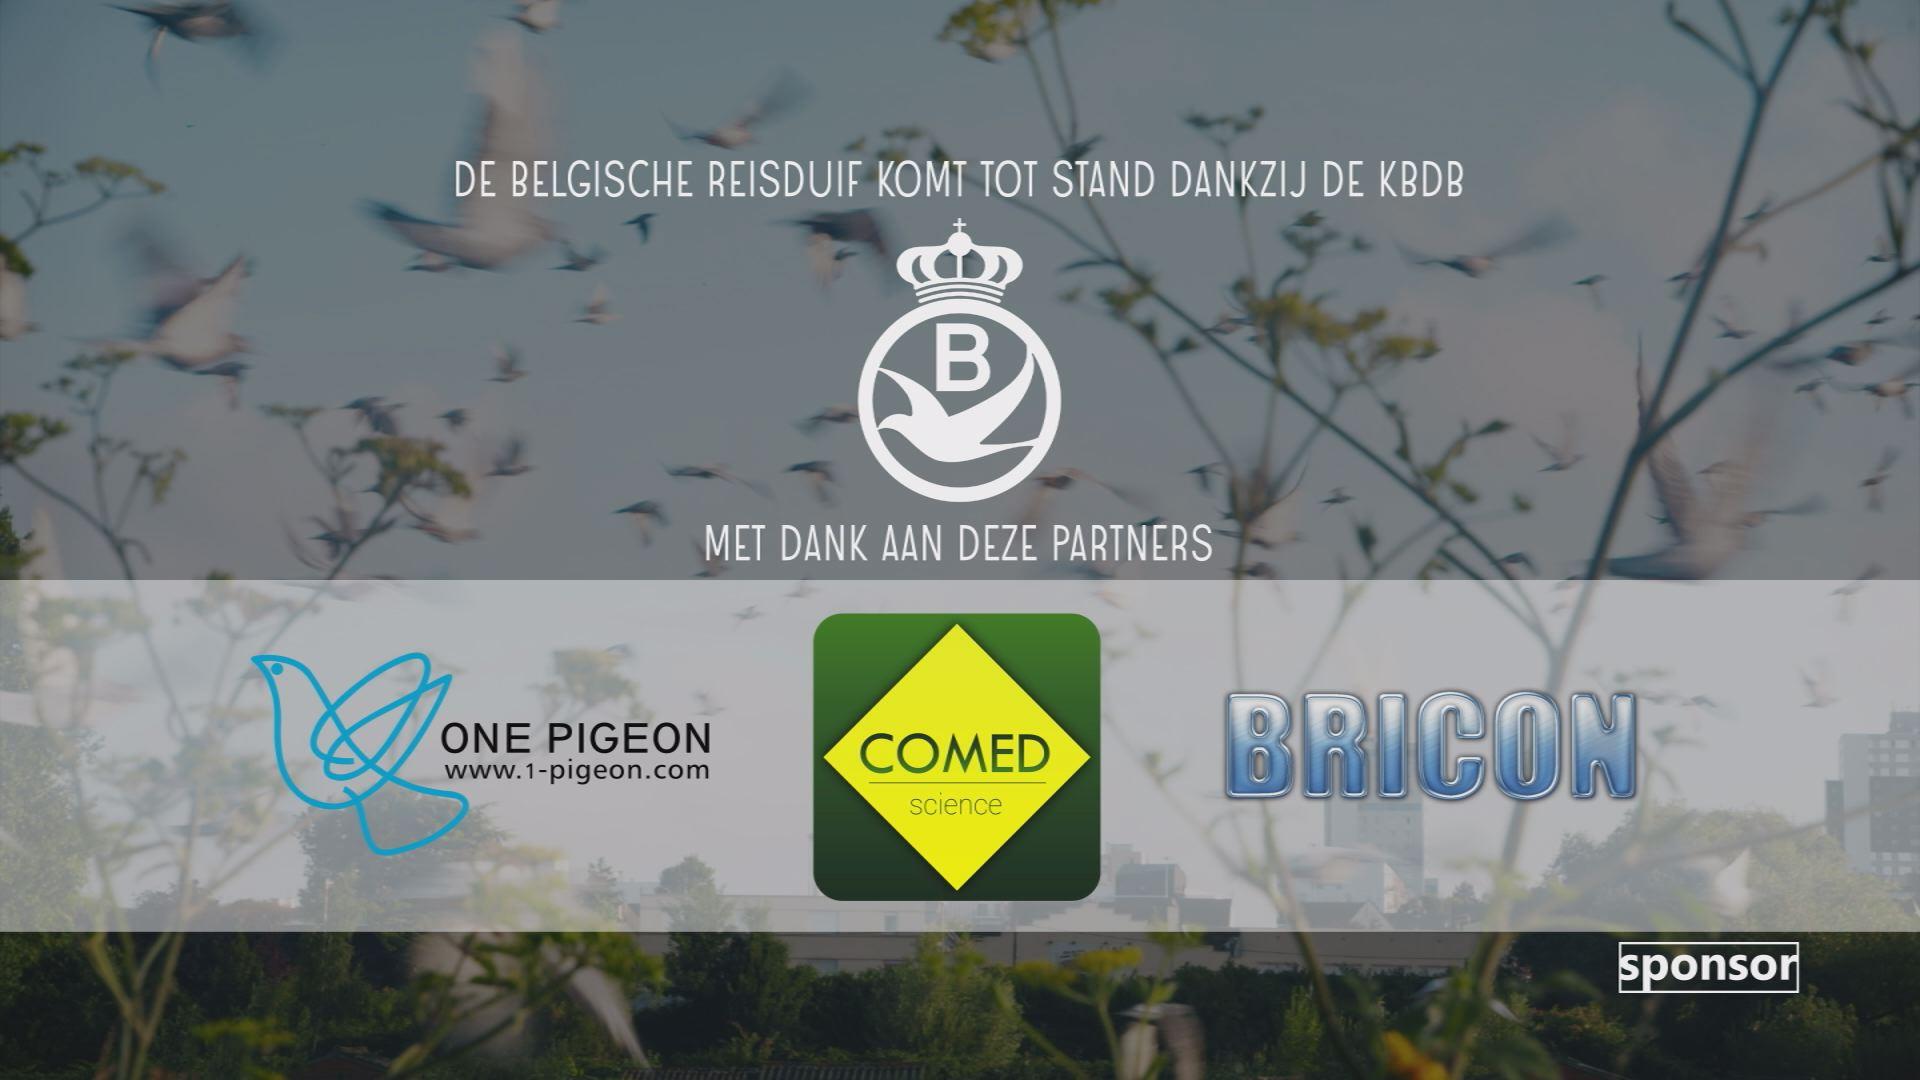 bb BelgischeReisduif